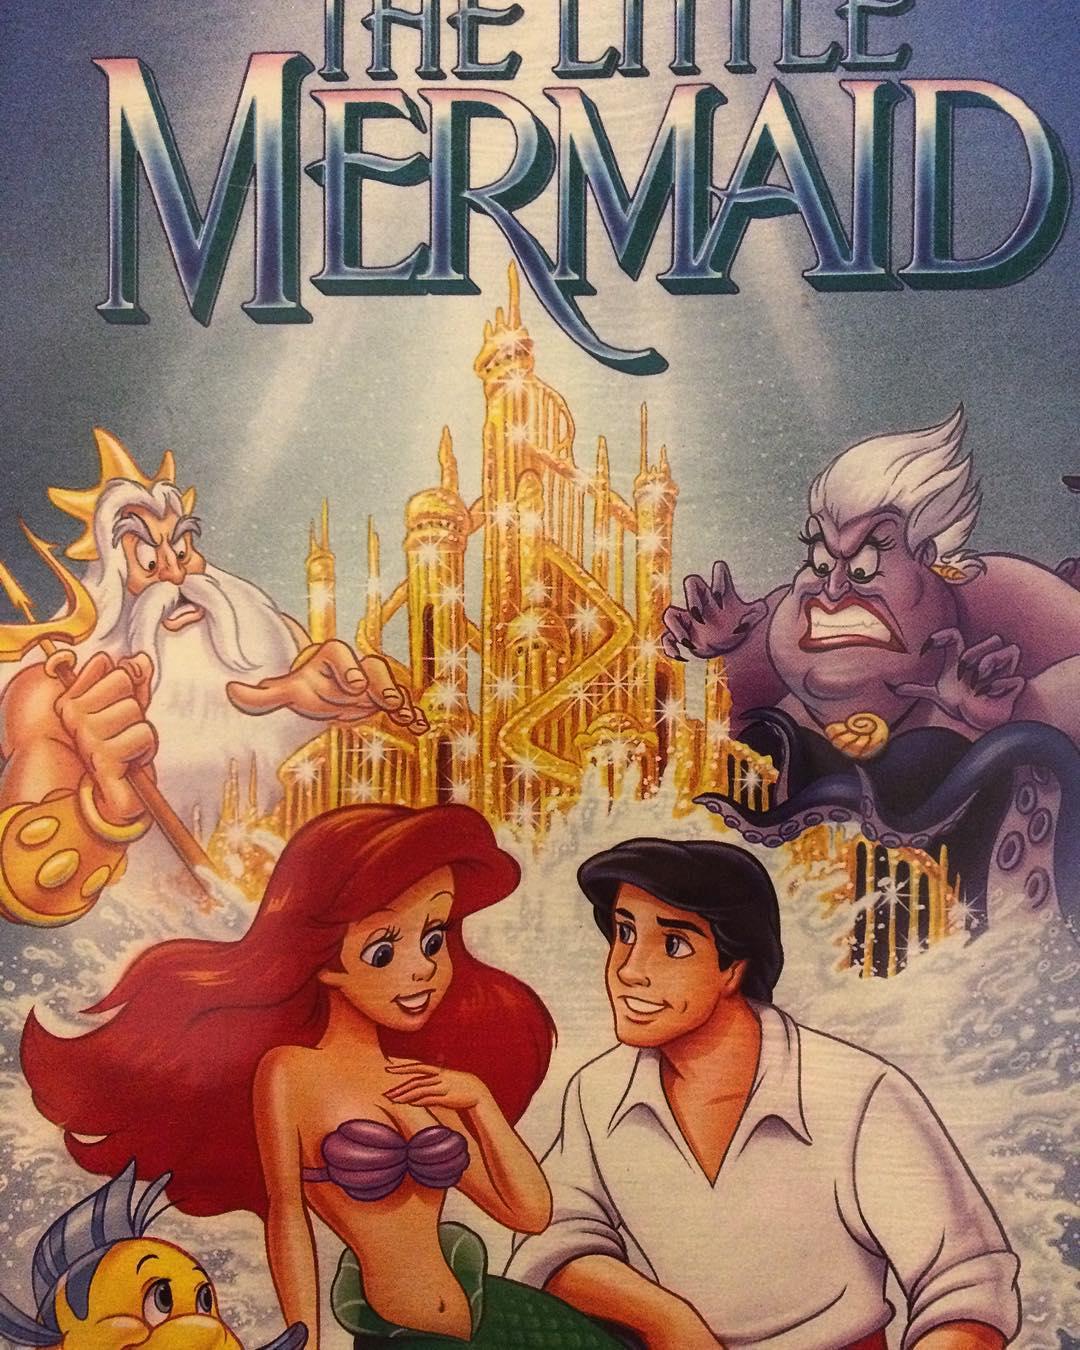 22069219 1901494419868328 5905937588027392000 n 29 Naughty Hidden Secrets In Disney Films